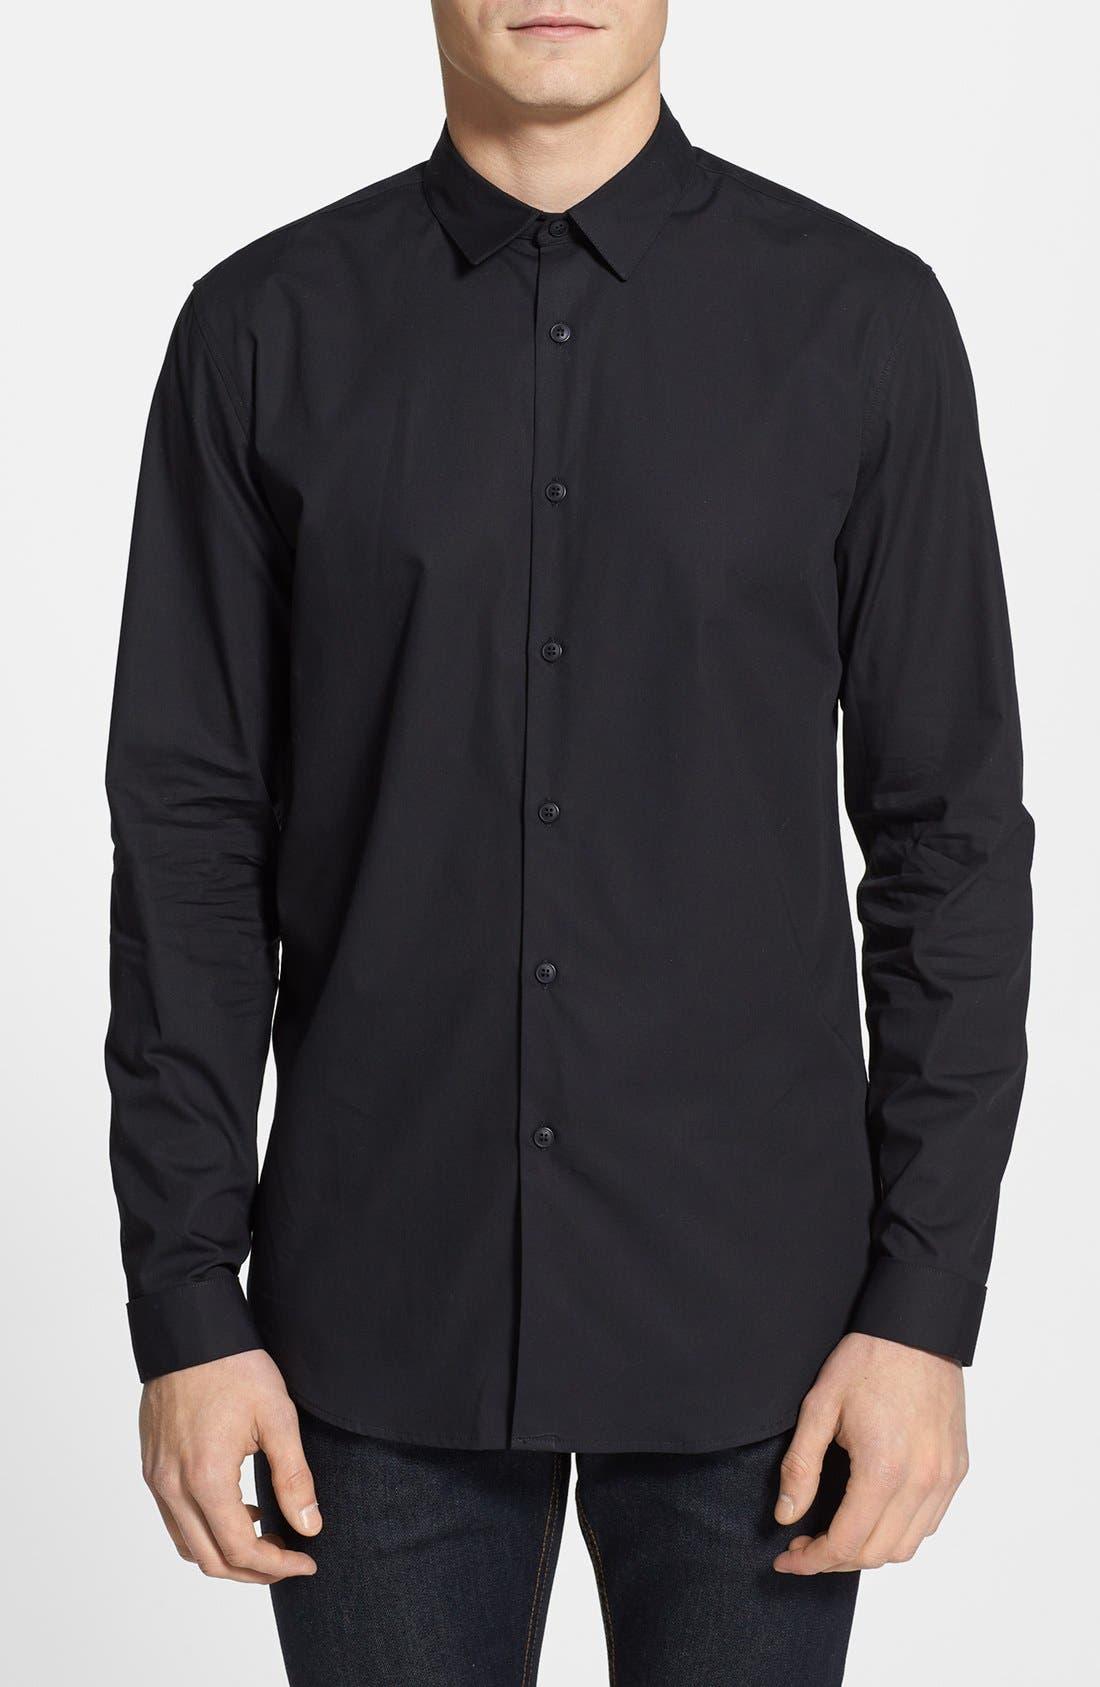 Alternate Image 1 Selected - Topman French Cuff Dress Shirt